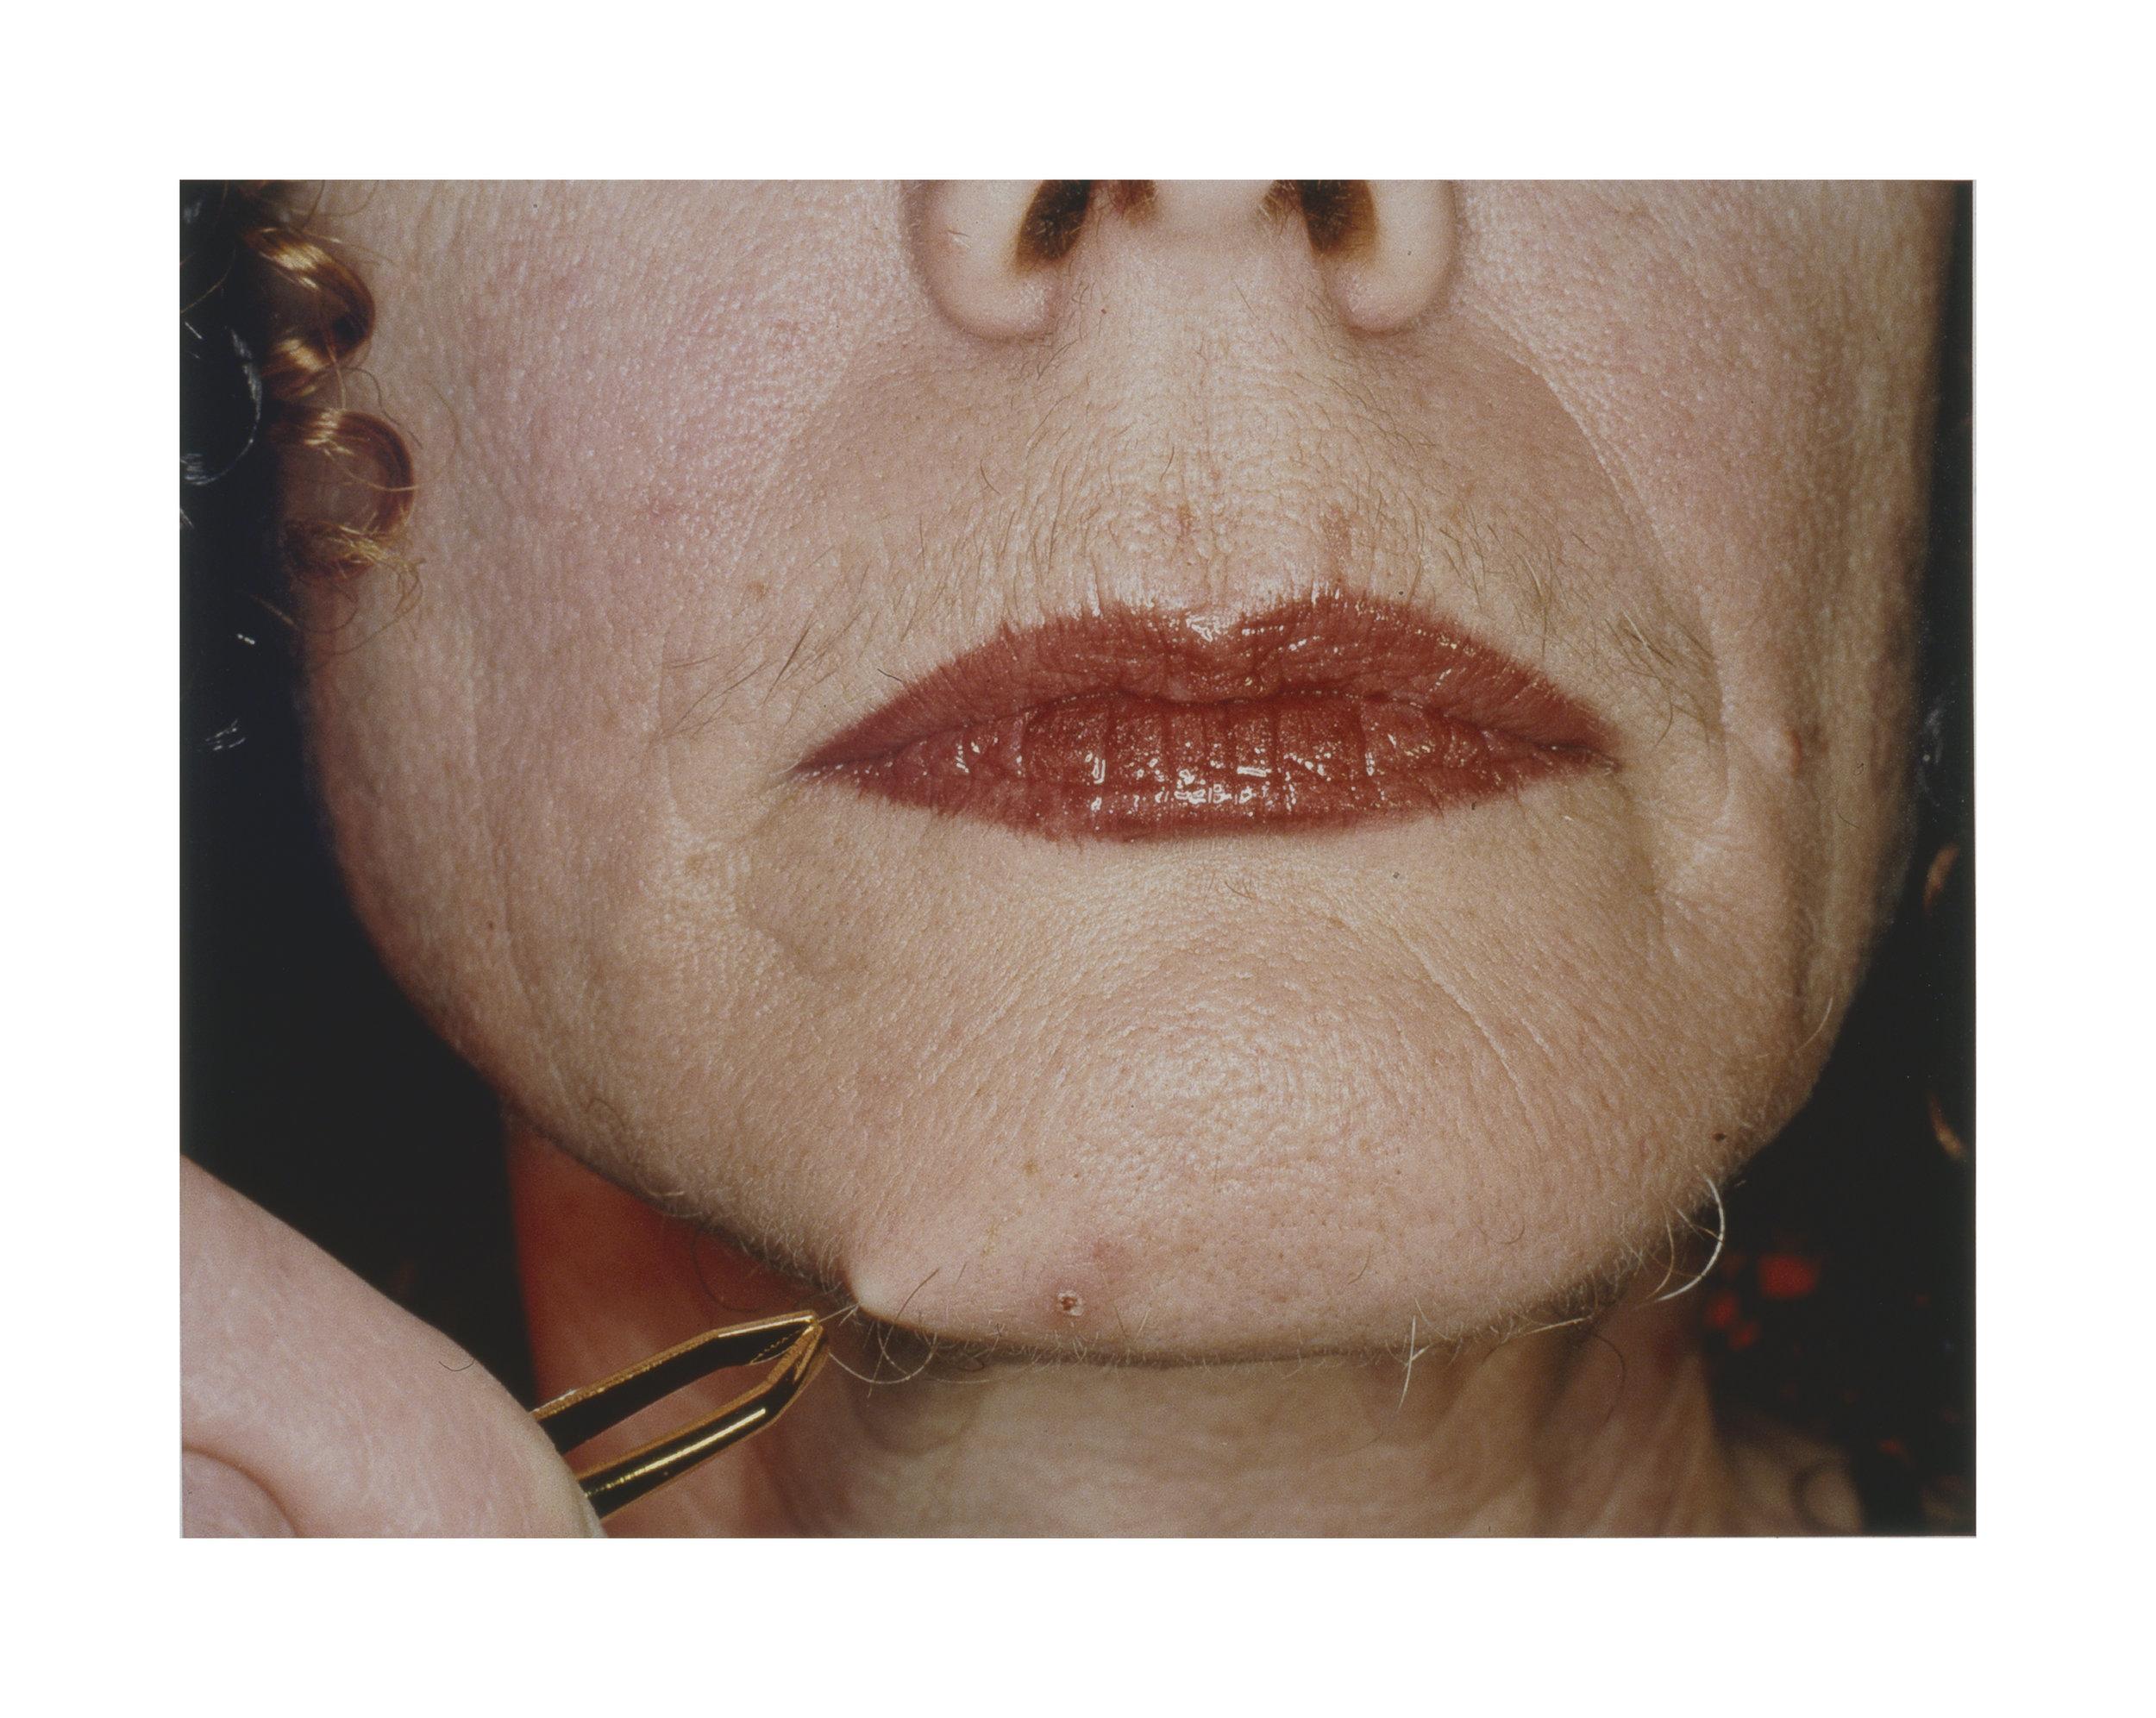 Pluck #2 , 2001, series: Beauty at A Proper Distance 2001-05  82.55 x 101.6 cm, digital chromogenic print